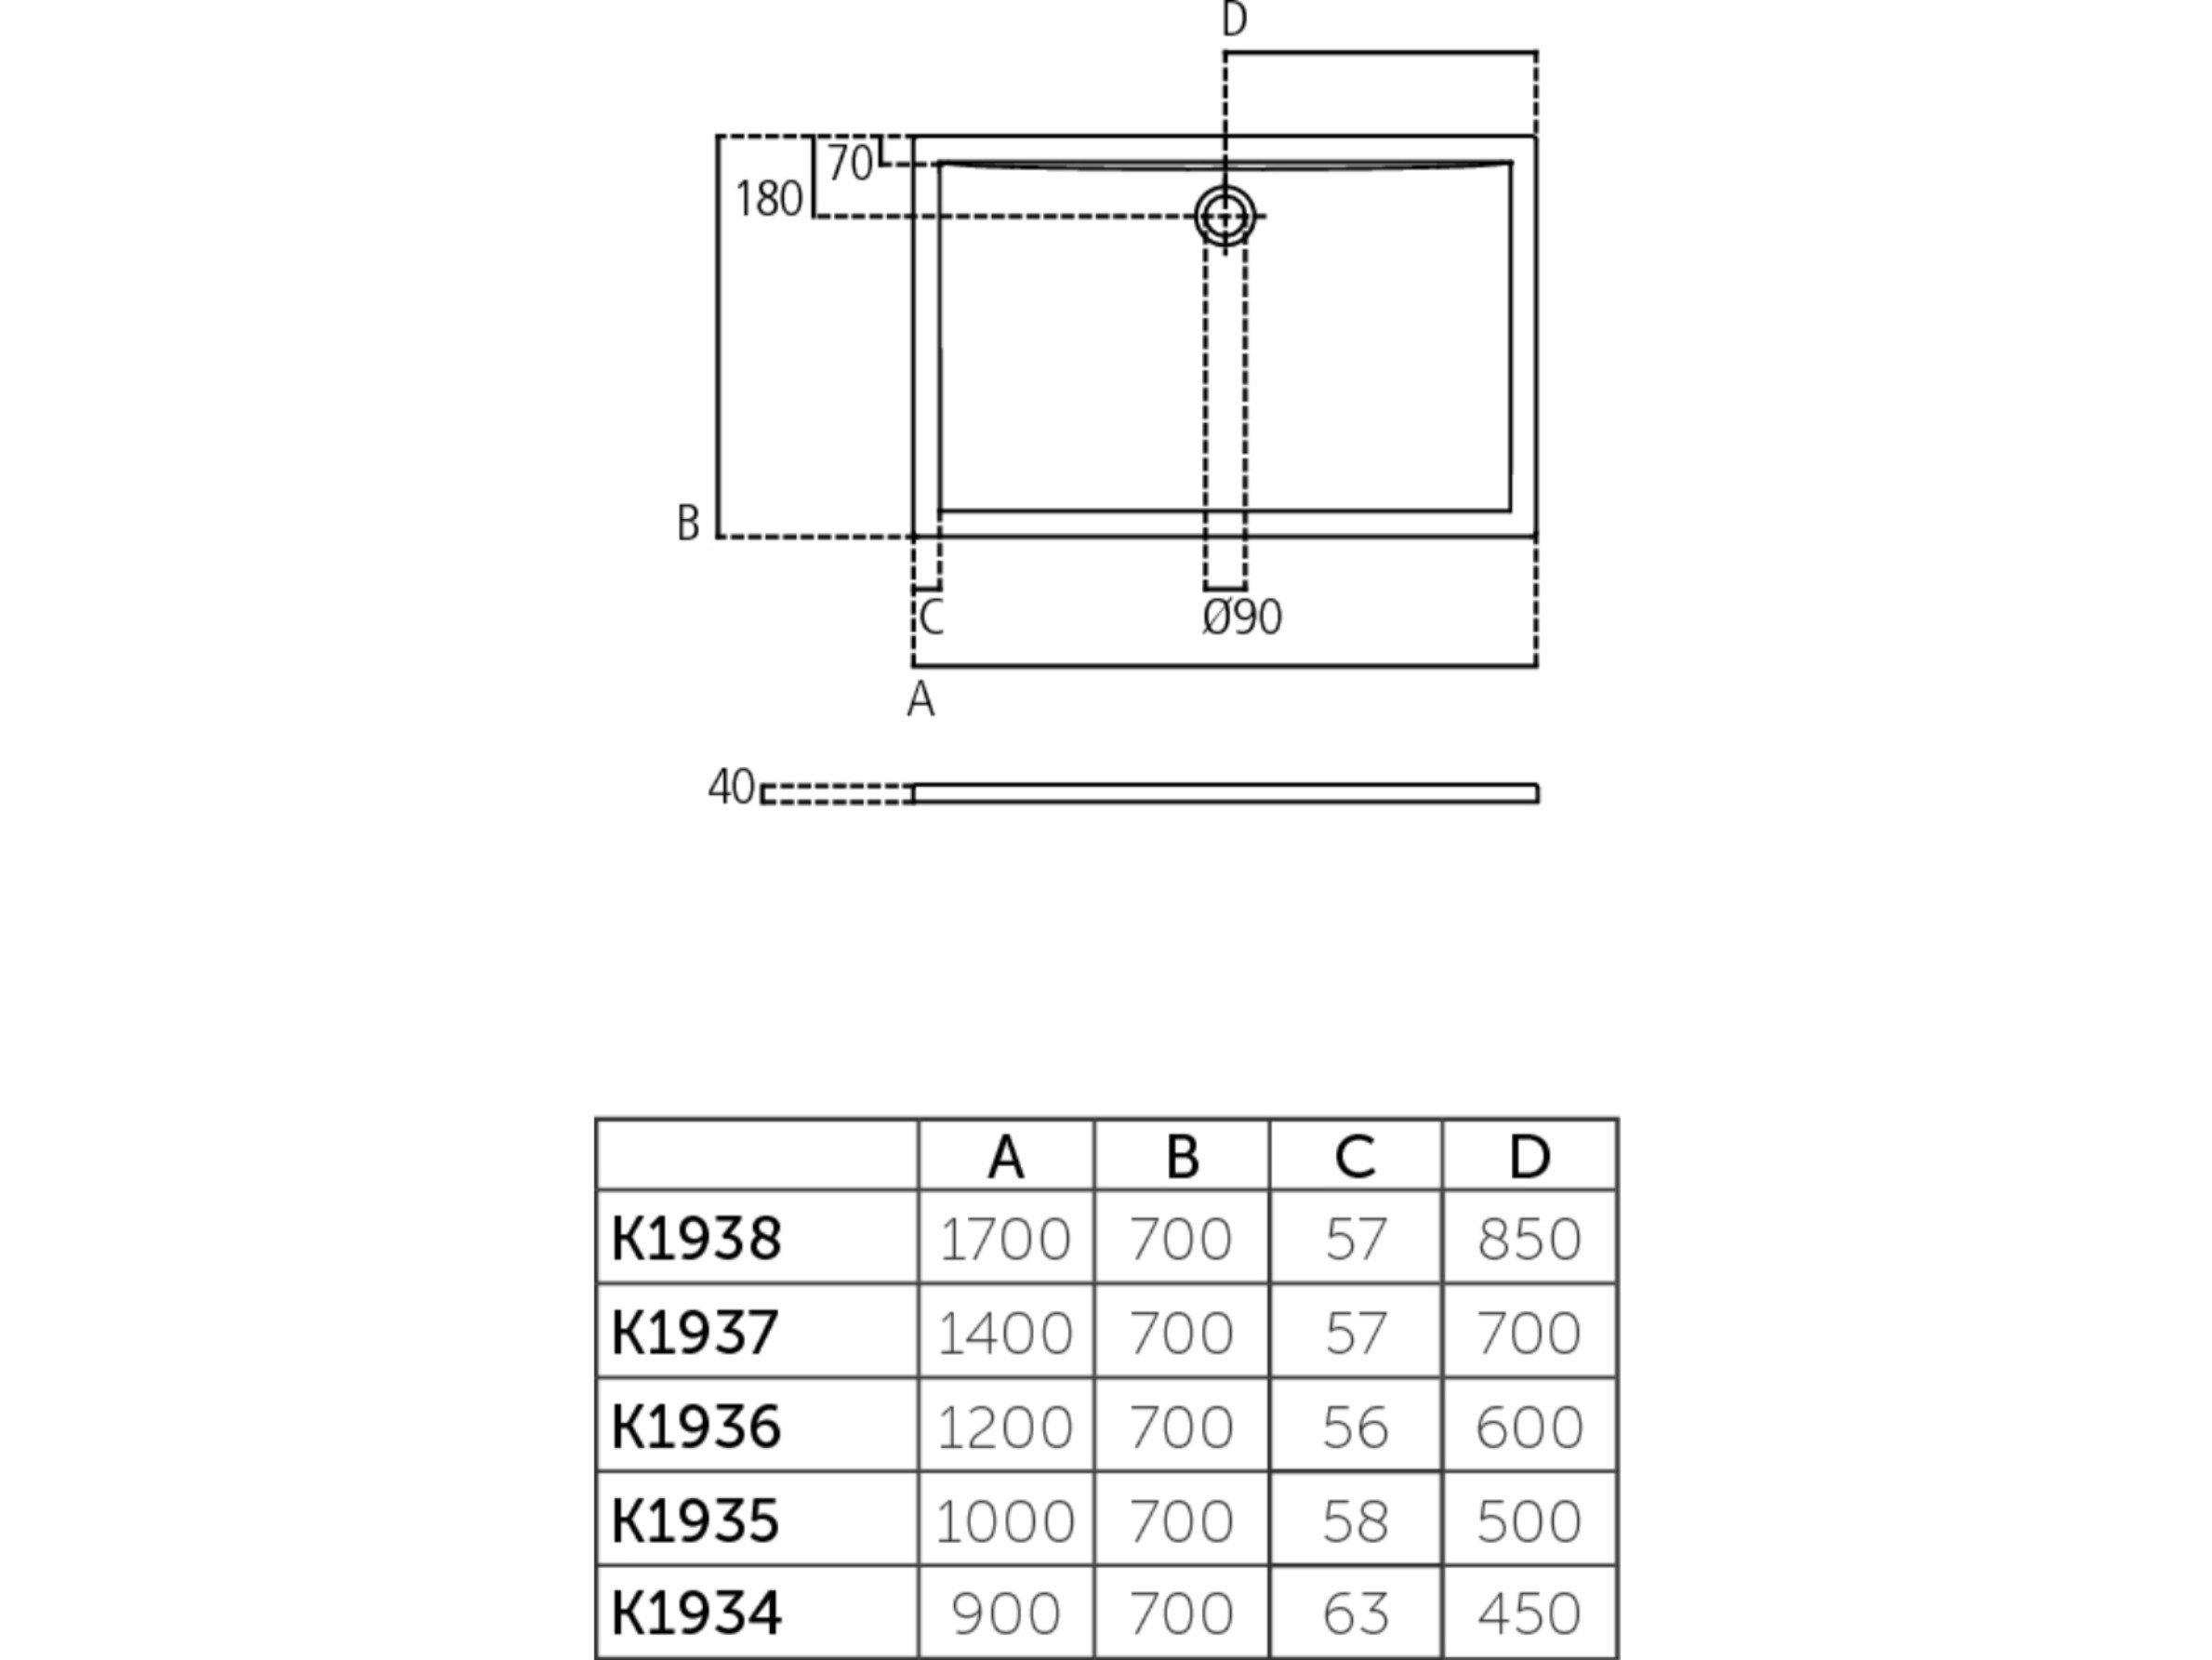 Rectangular Acrylic Shower Tray Ultra Flat 170 X 70 Cm K1938 By Ideal Standard